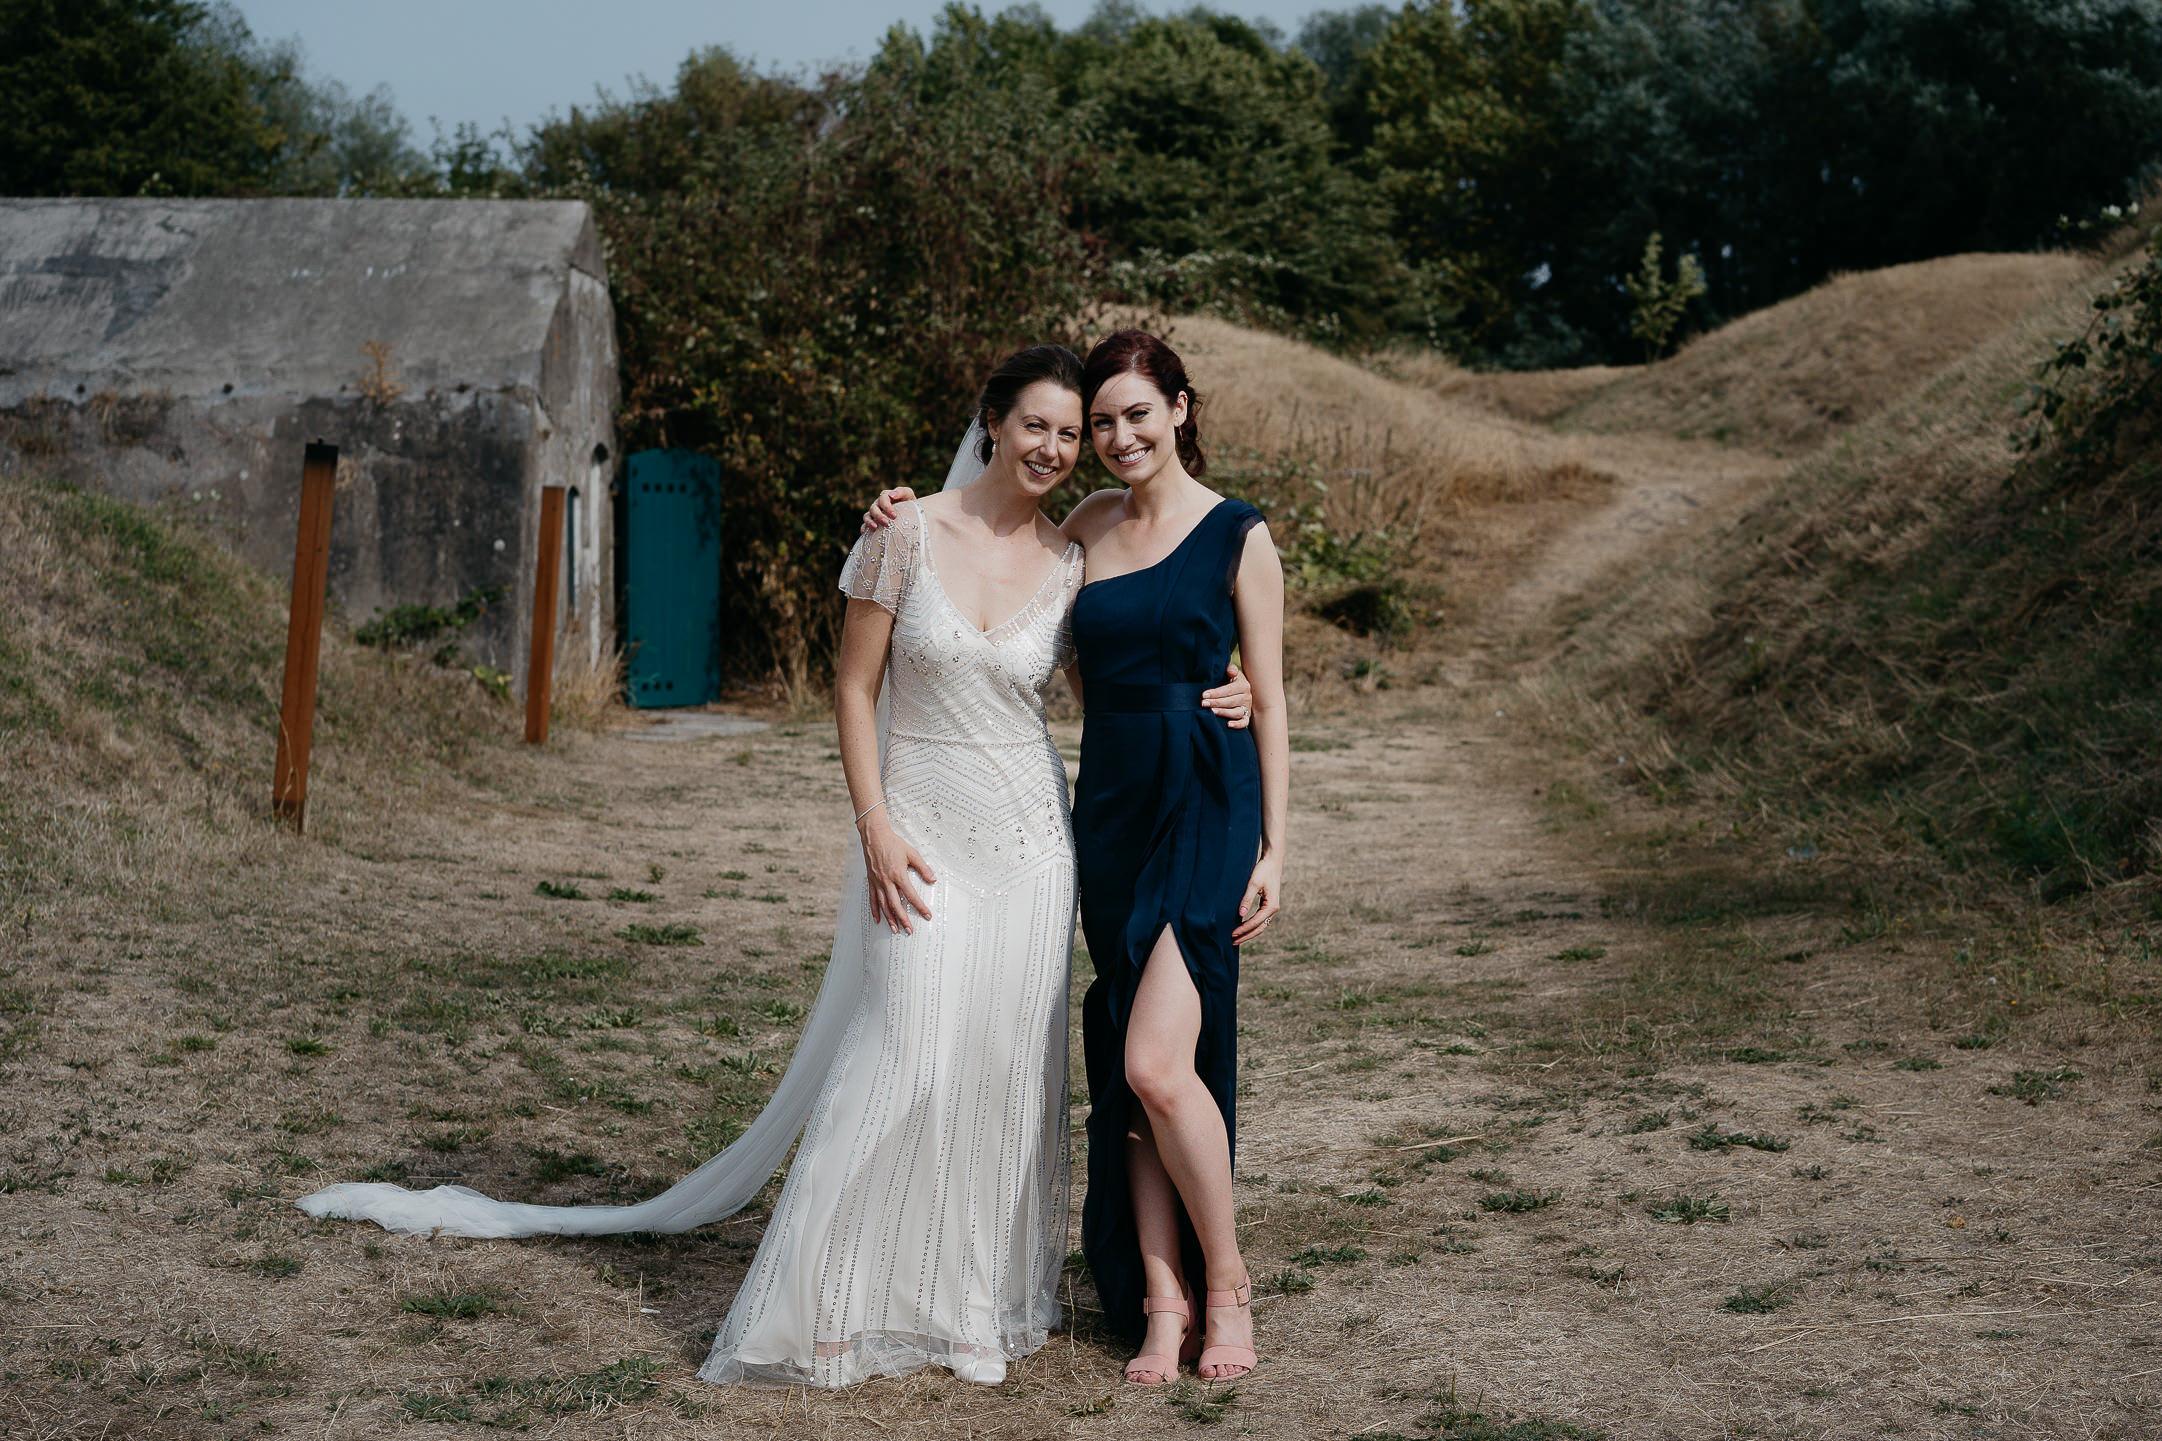 bruidsfotografie-trouwfotograaf-amsterdam-utrecht-mark-hadden-Laura-Craig-220.jpg